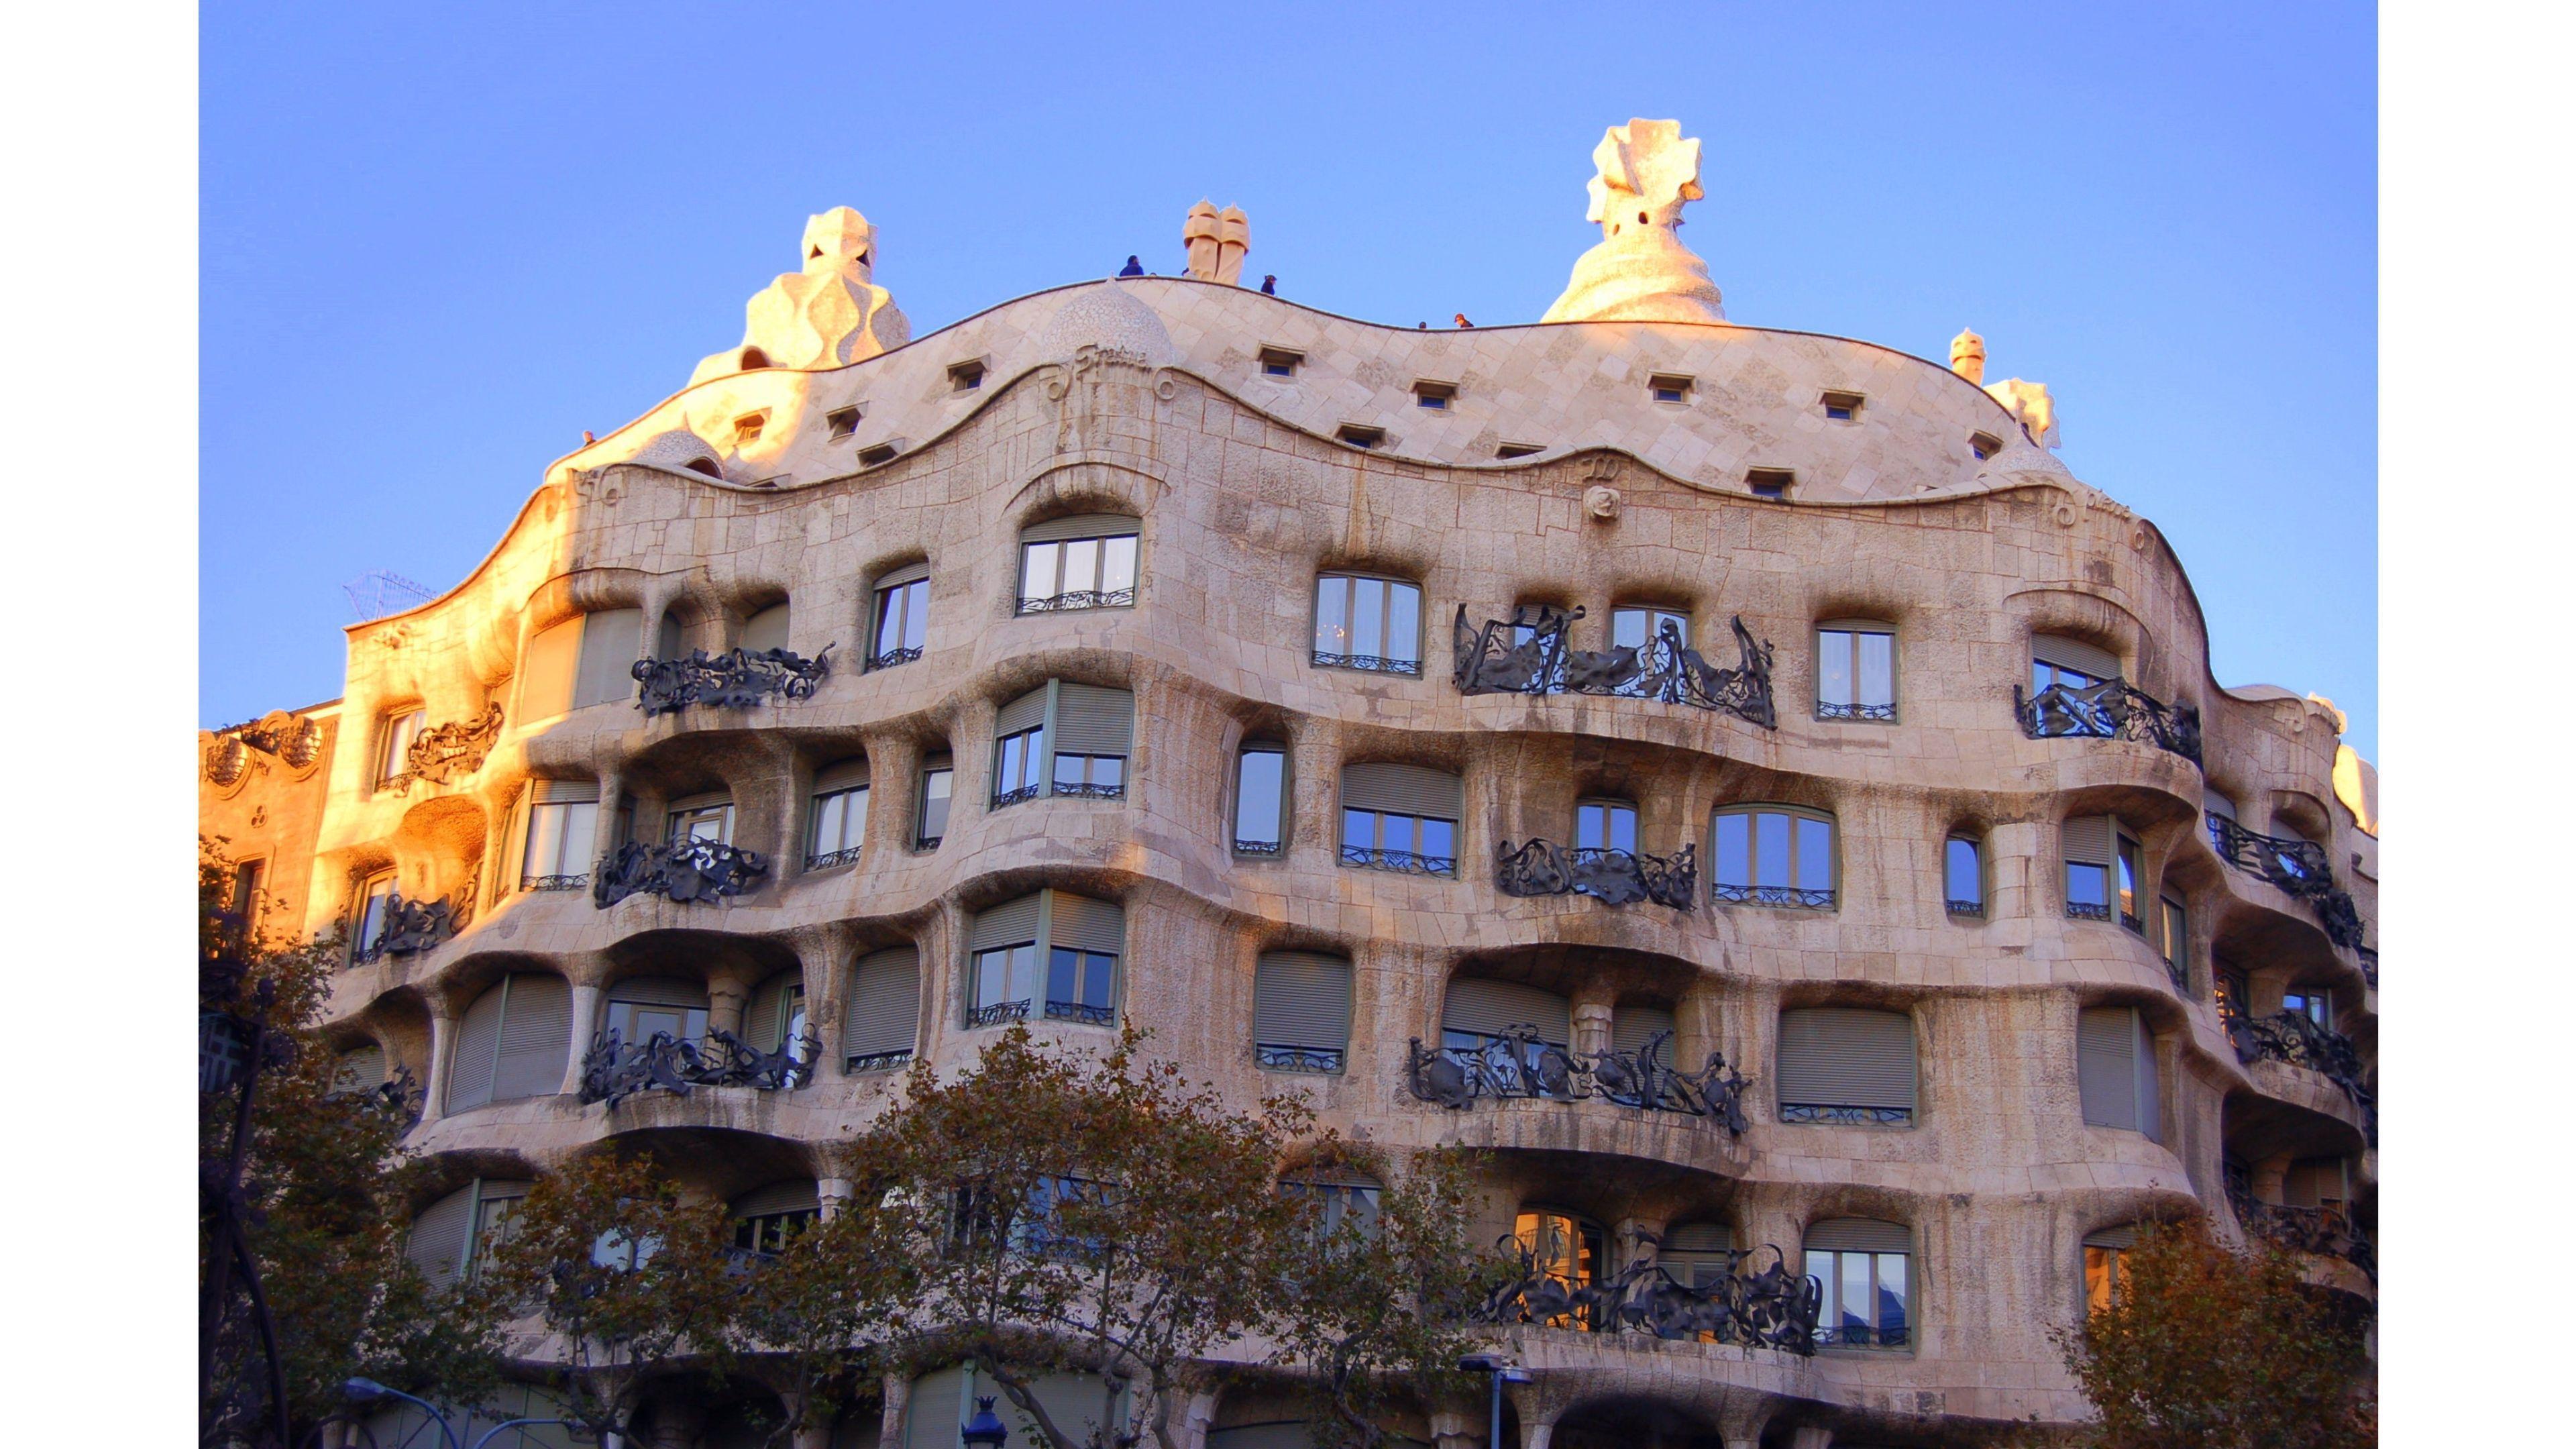 historical barcelona spain 4k - photo #10